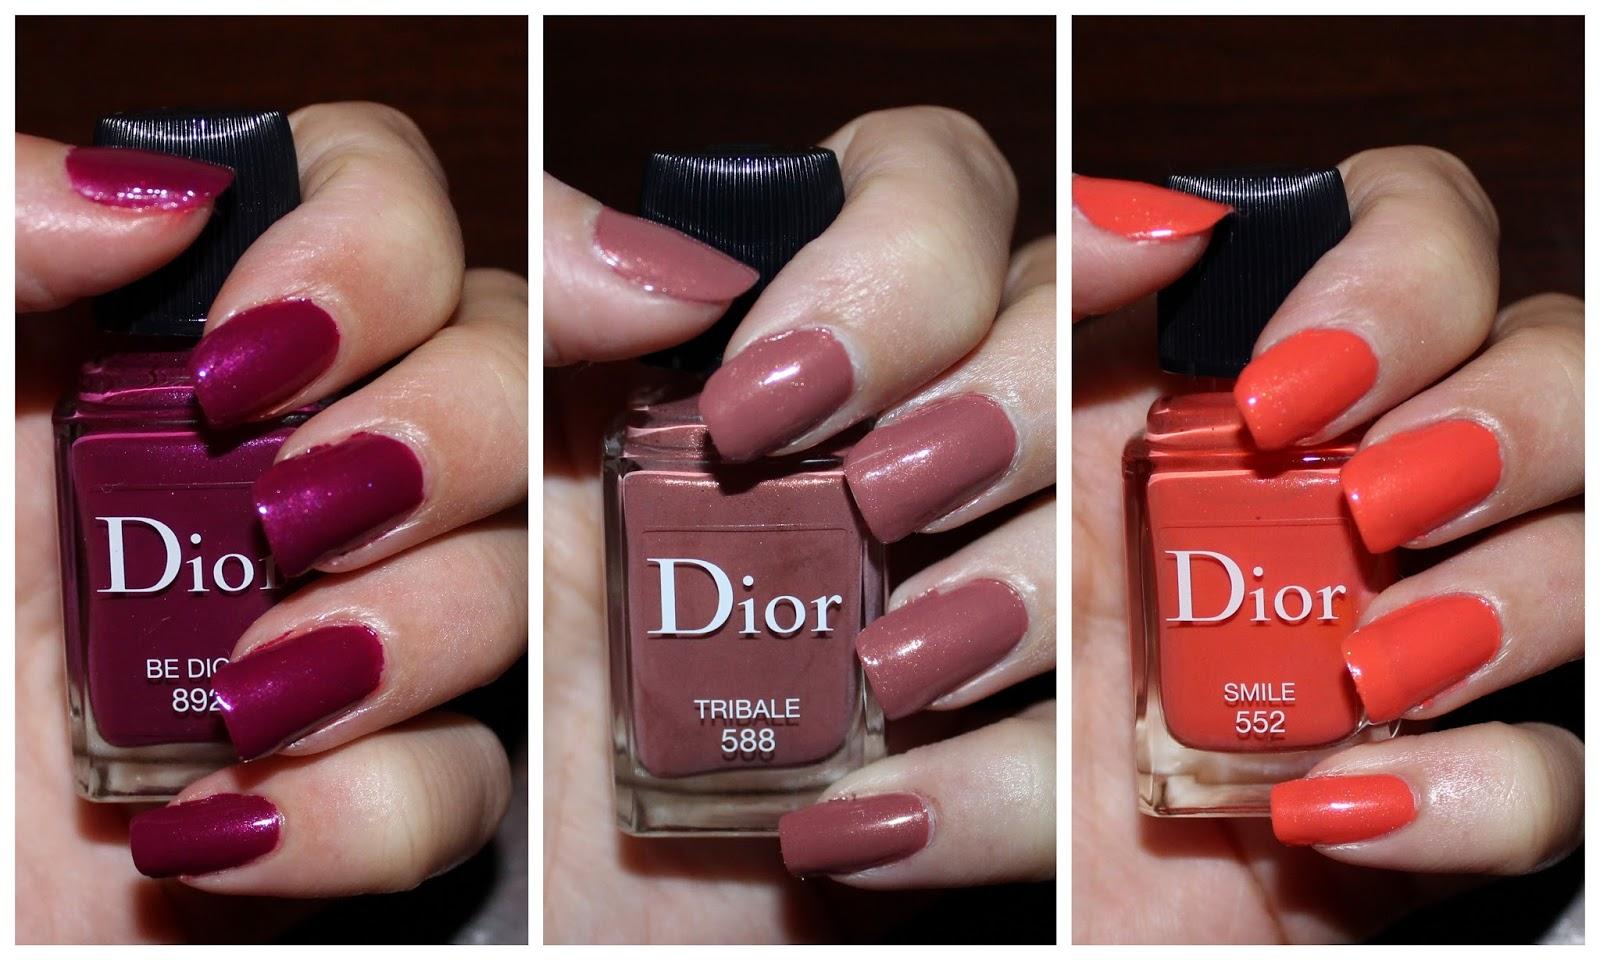 Dior Vernis in 552 Smile, 588 Tribale & 892 Be Dior